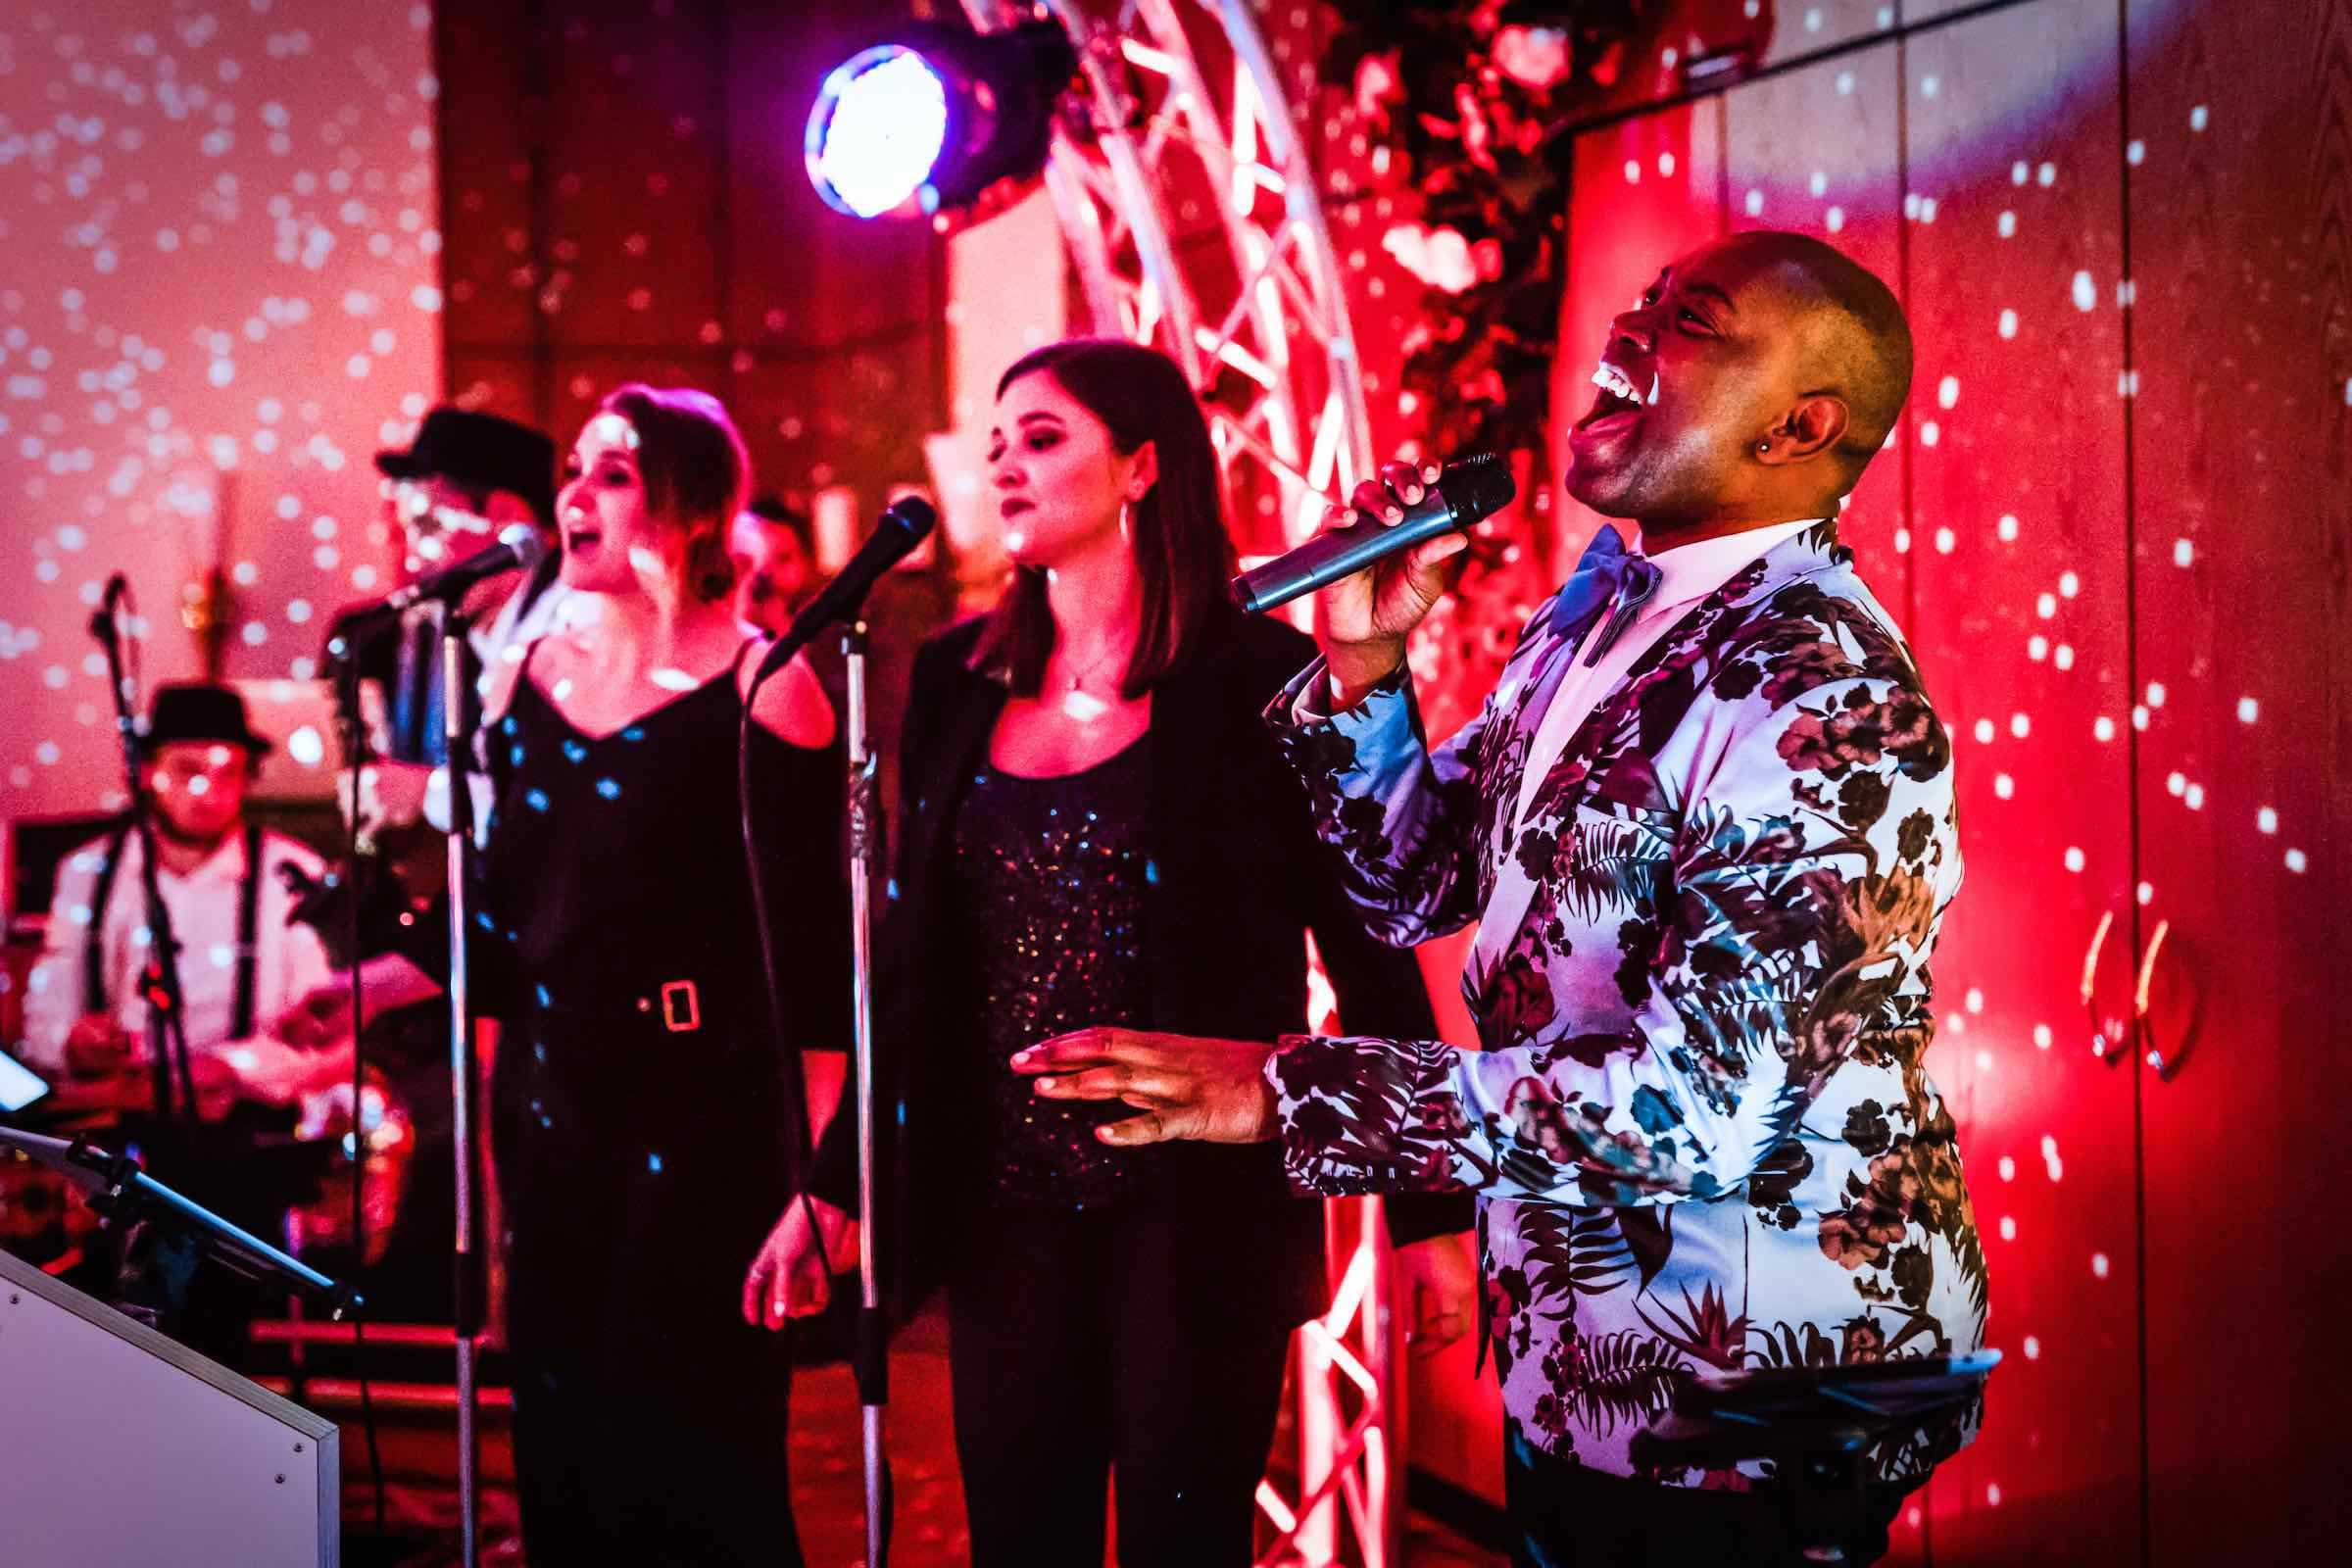 Partyband   Hochzeit   Hannover   Buchen   Liveband   Livemusik   Pop   Swing   Jazz   Band   Sänger   Empfang   Standesamt   Messe   Firmenfeier   Buchen   Mieten   Anfragen   Lehmann   Eventservice